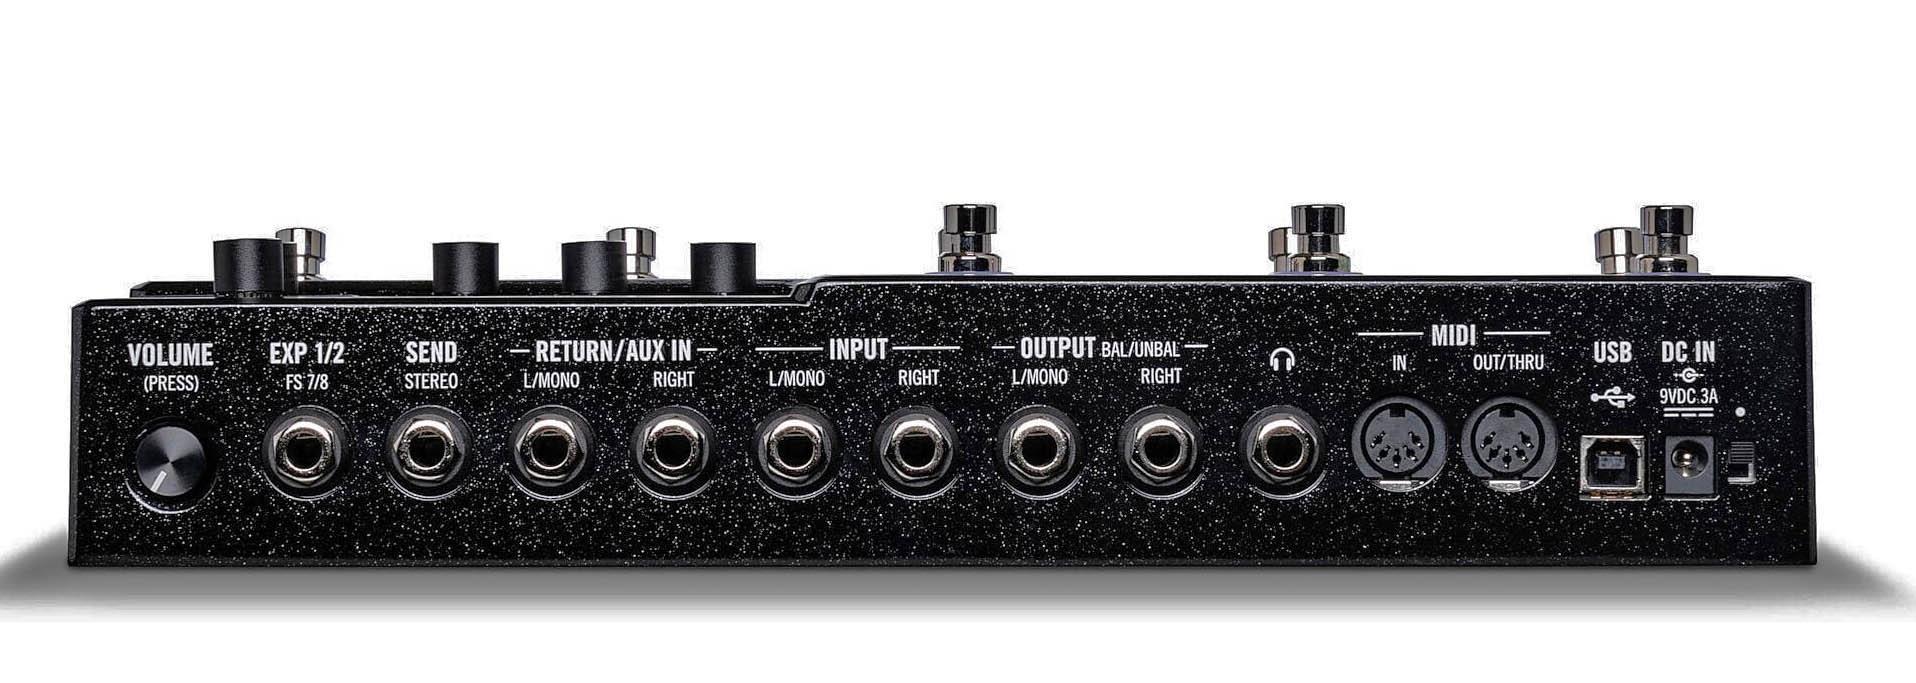 Rumores Namm 2021 - Line 6 HX Stomp XL - Age of Audio